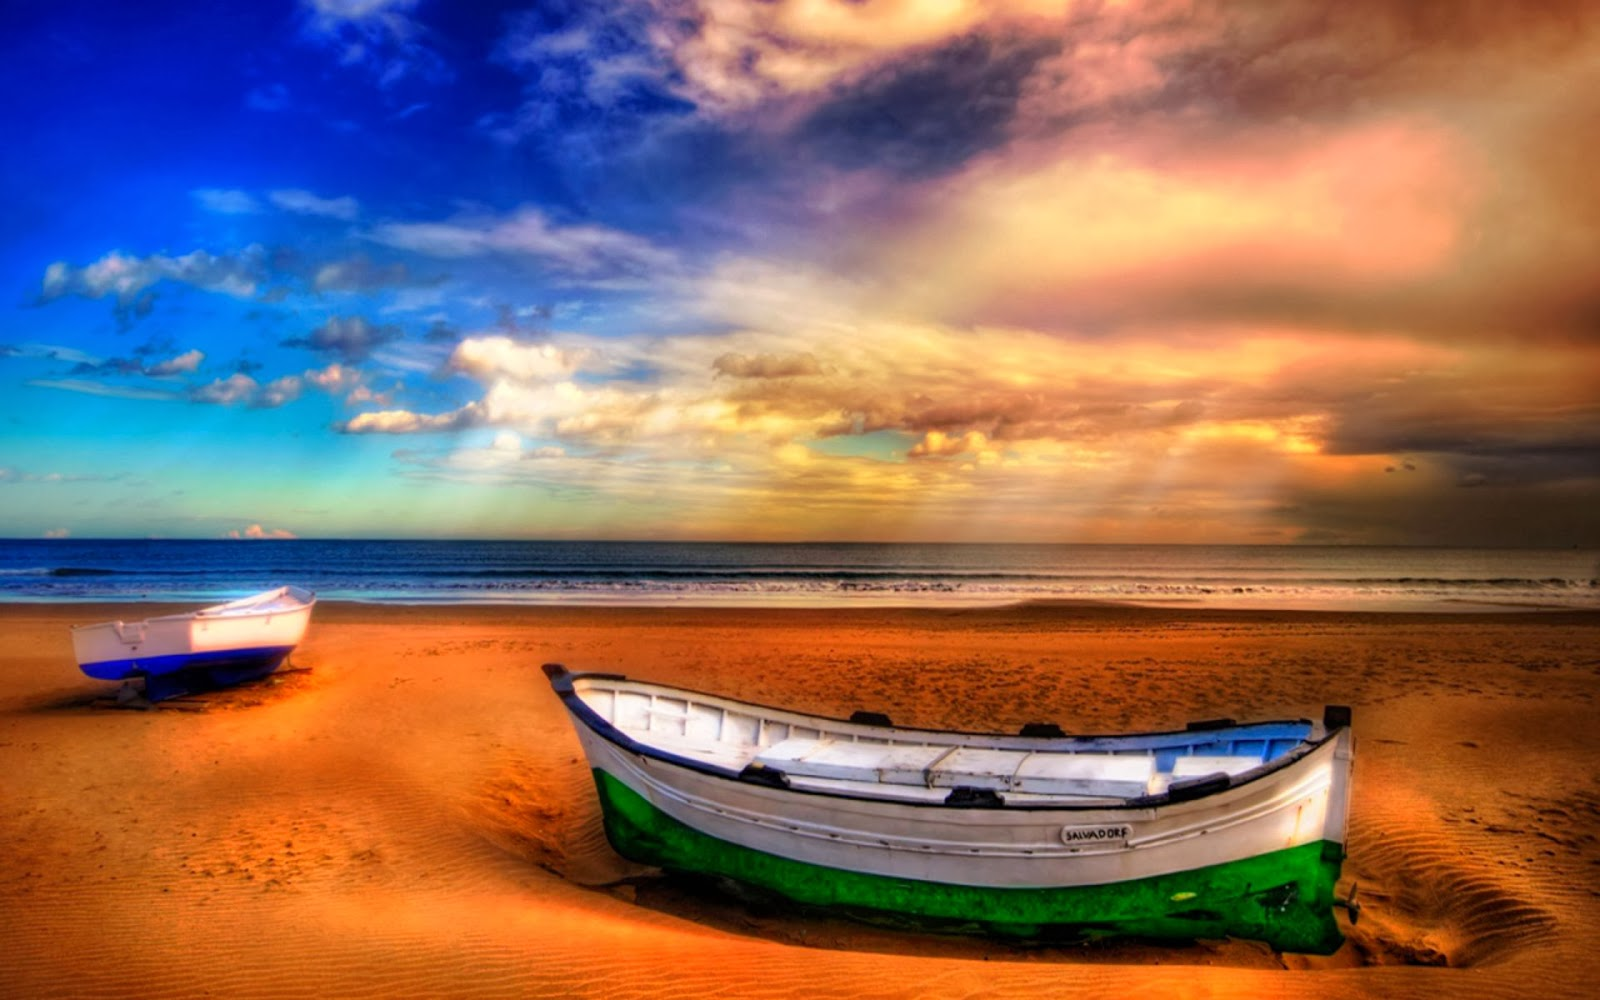 Barcos en playa perfecta